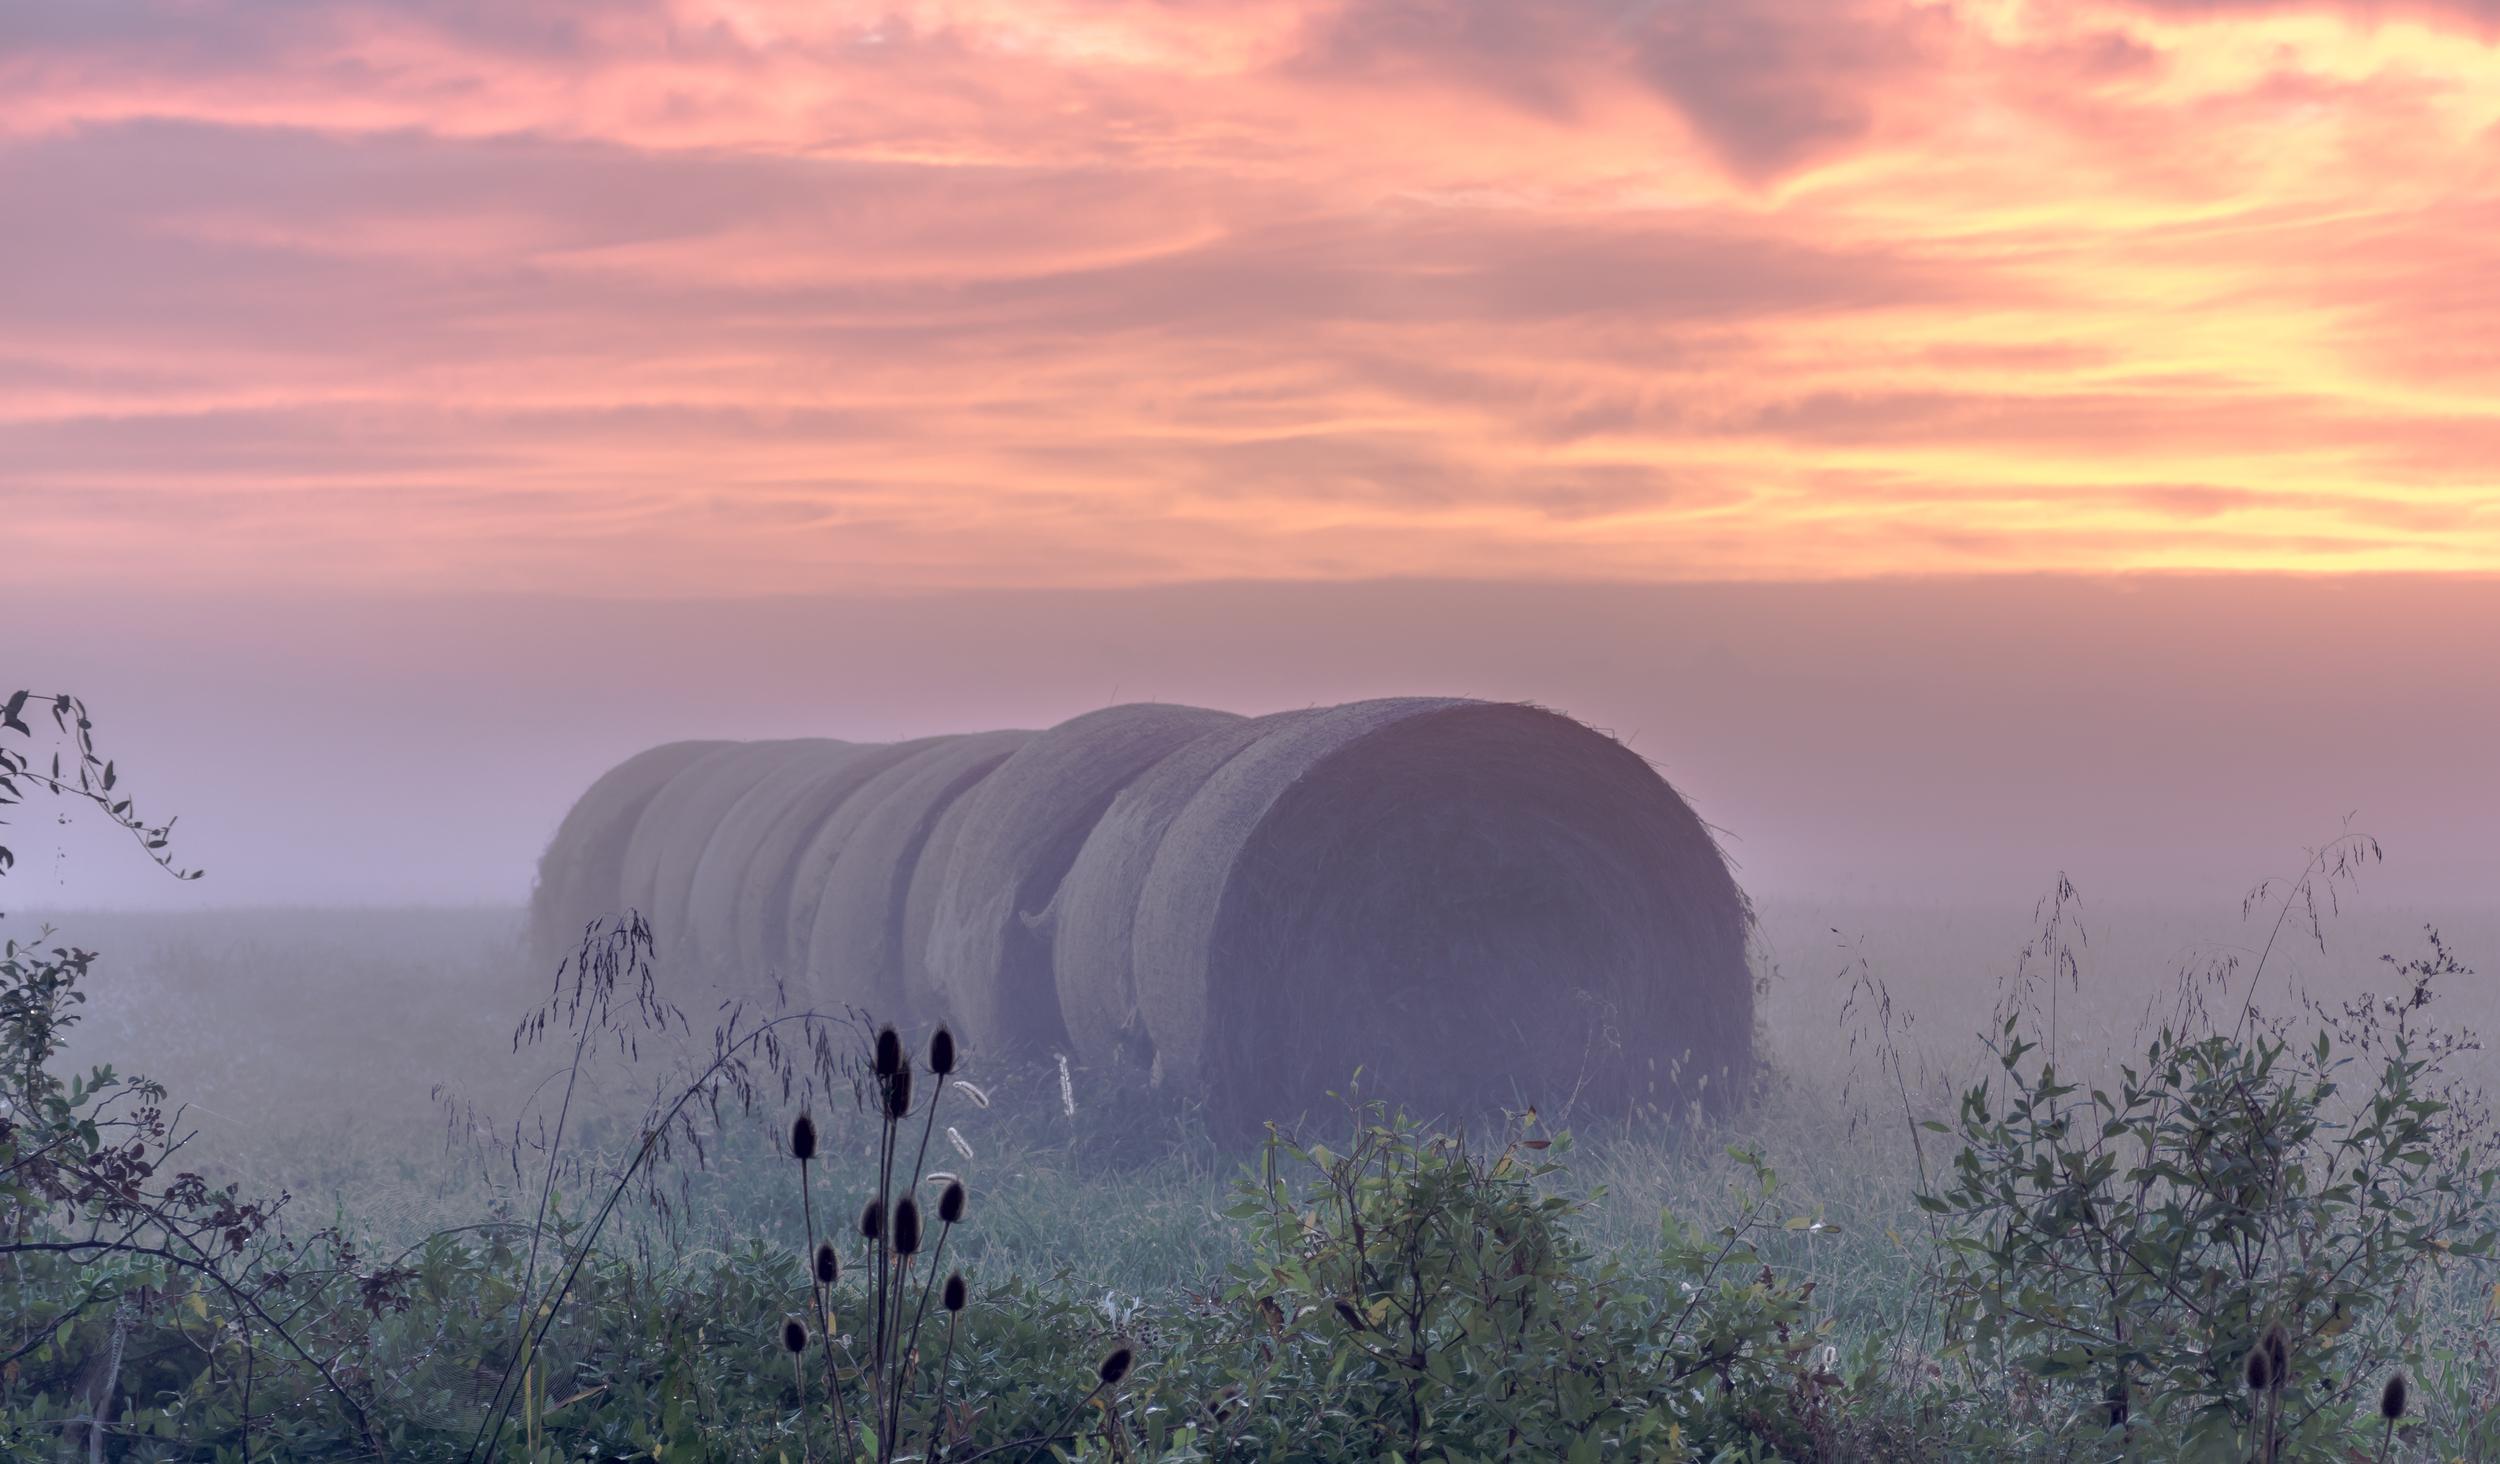 Hayroll in the Morning Mist